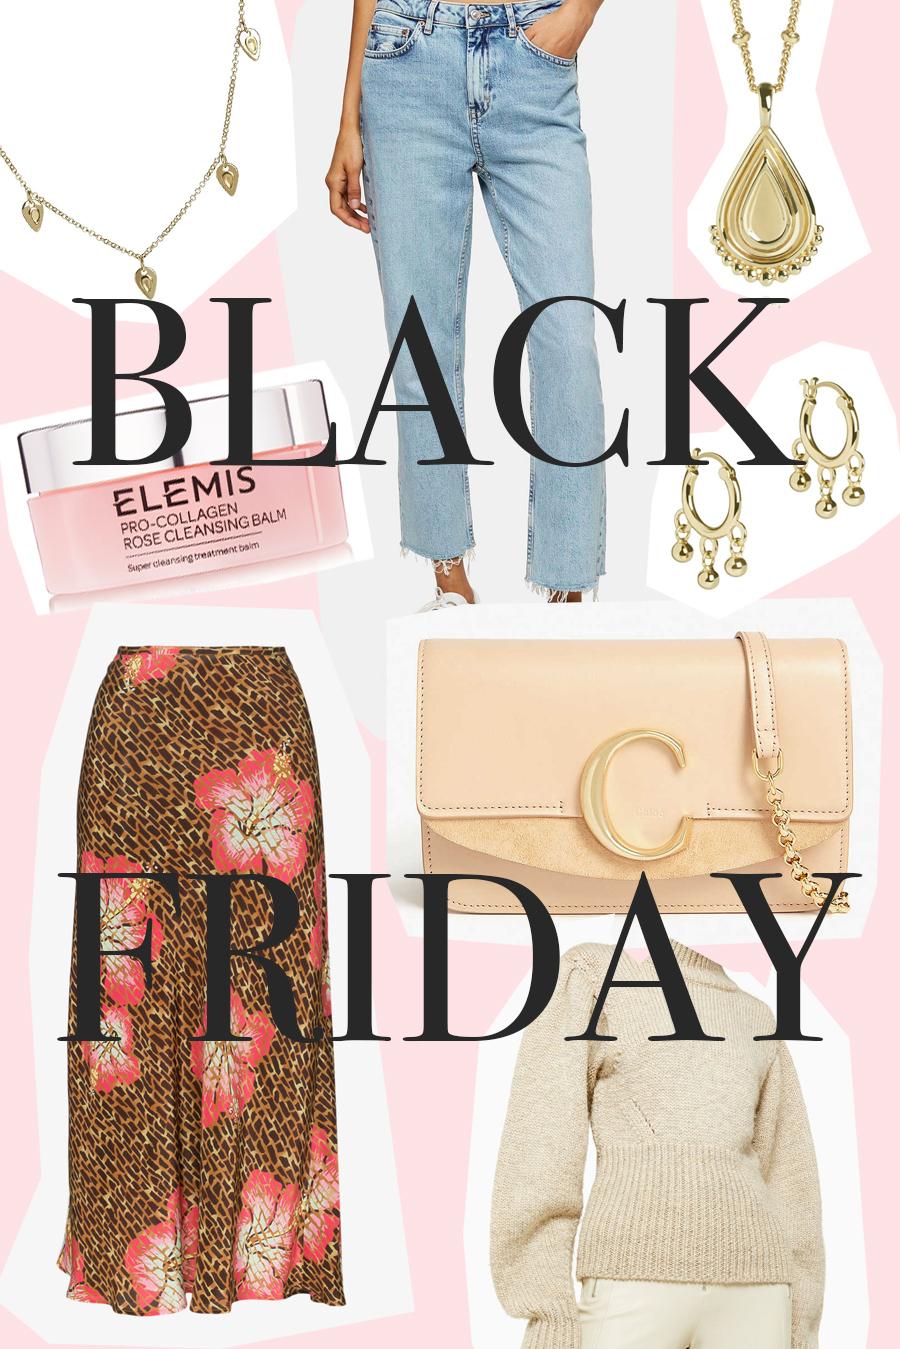 Belle & Bunty London Fashion & Style Blog